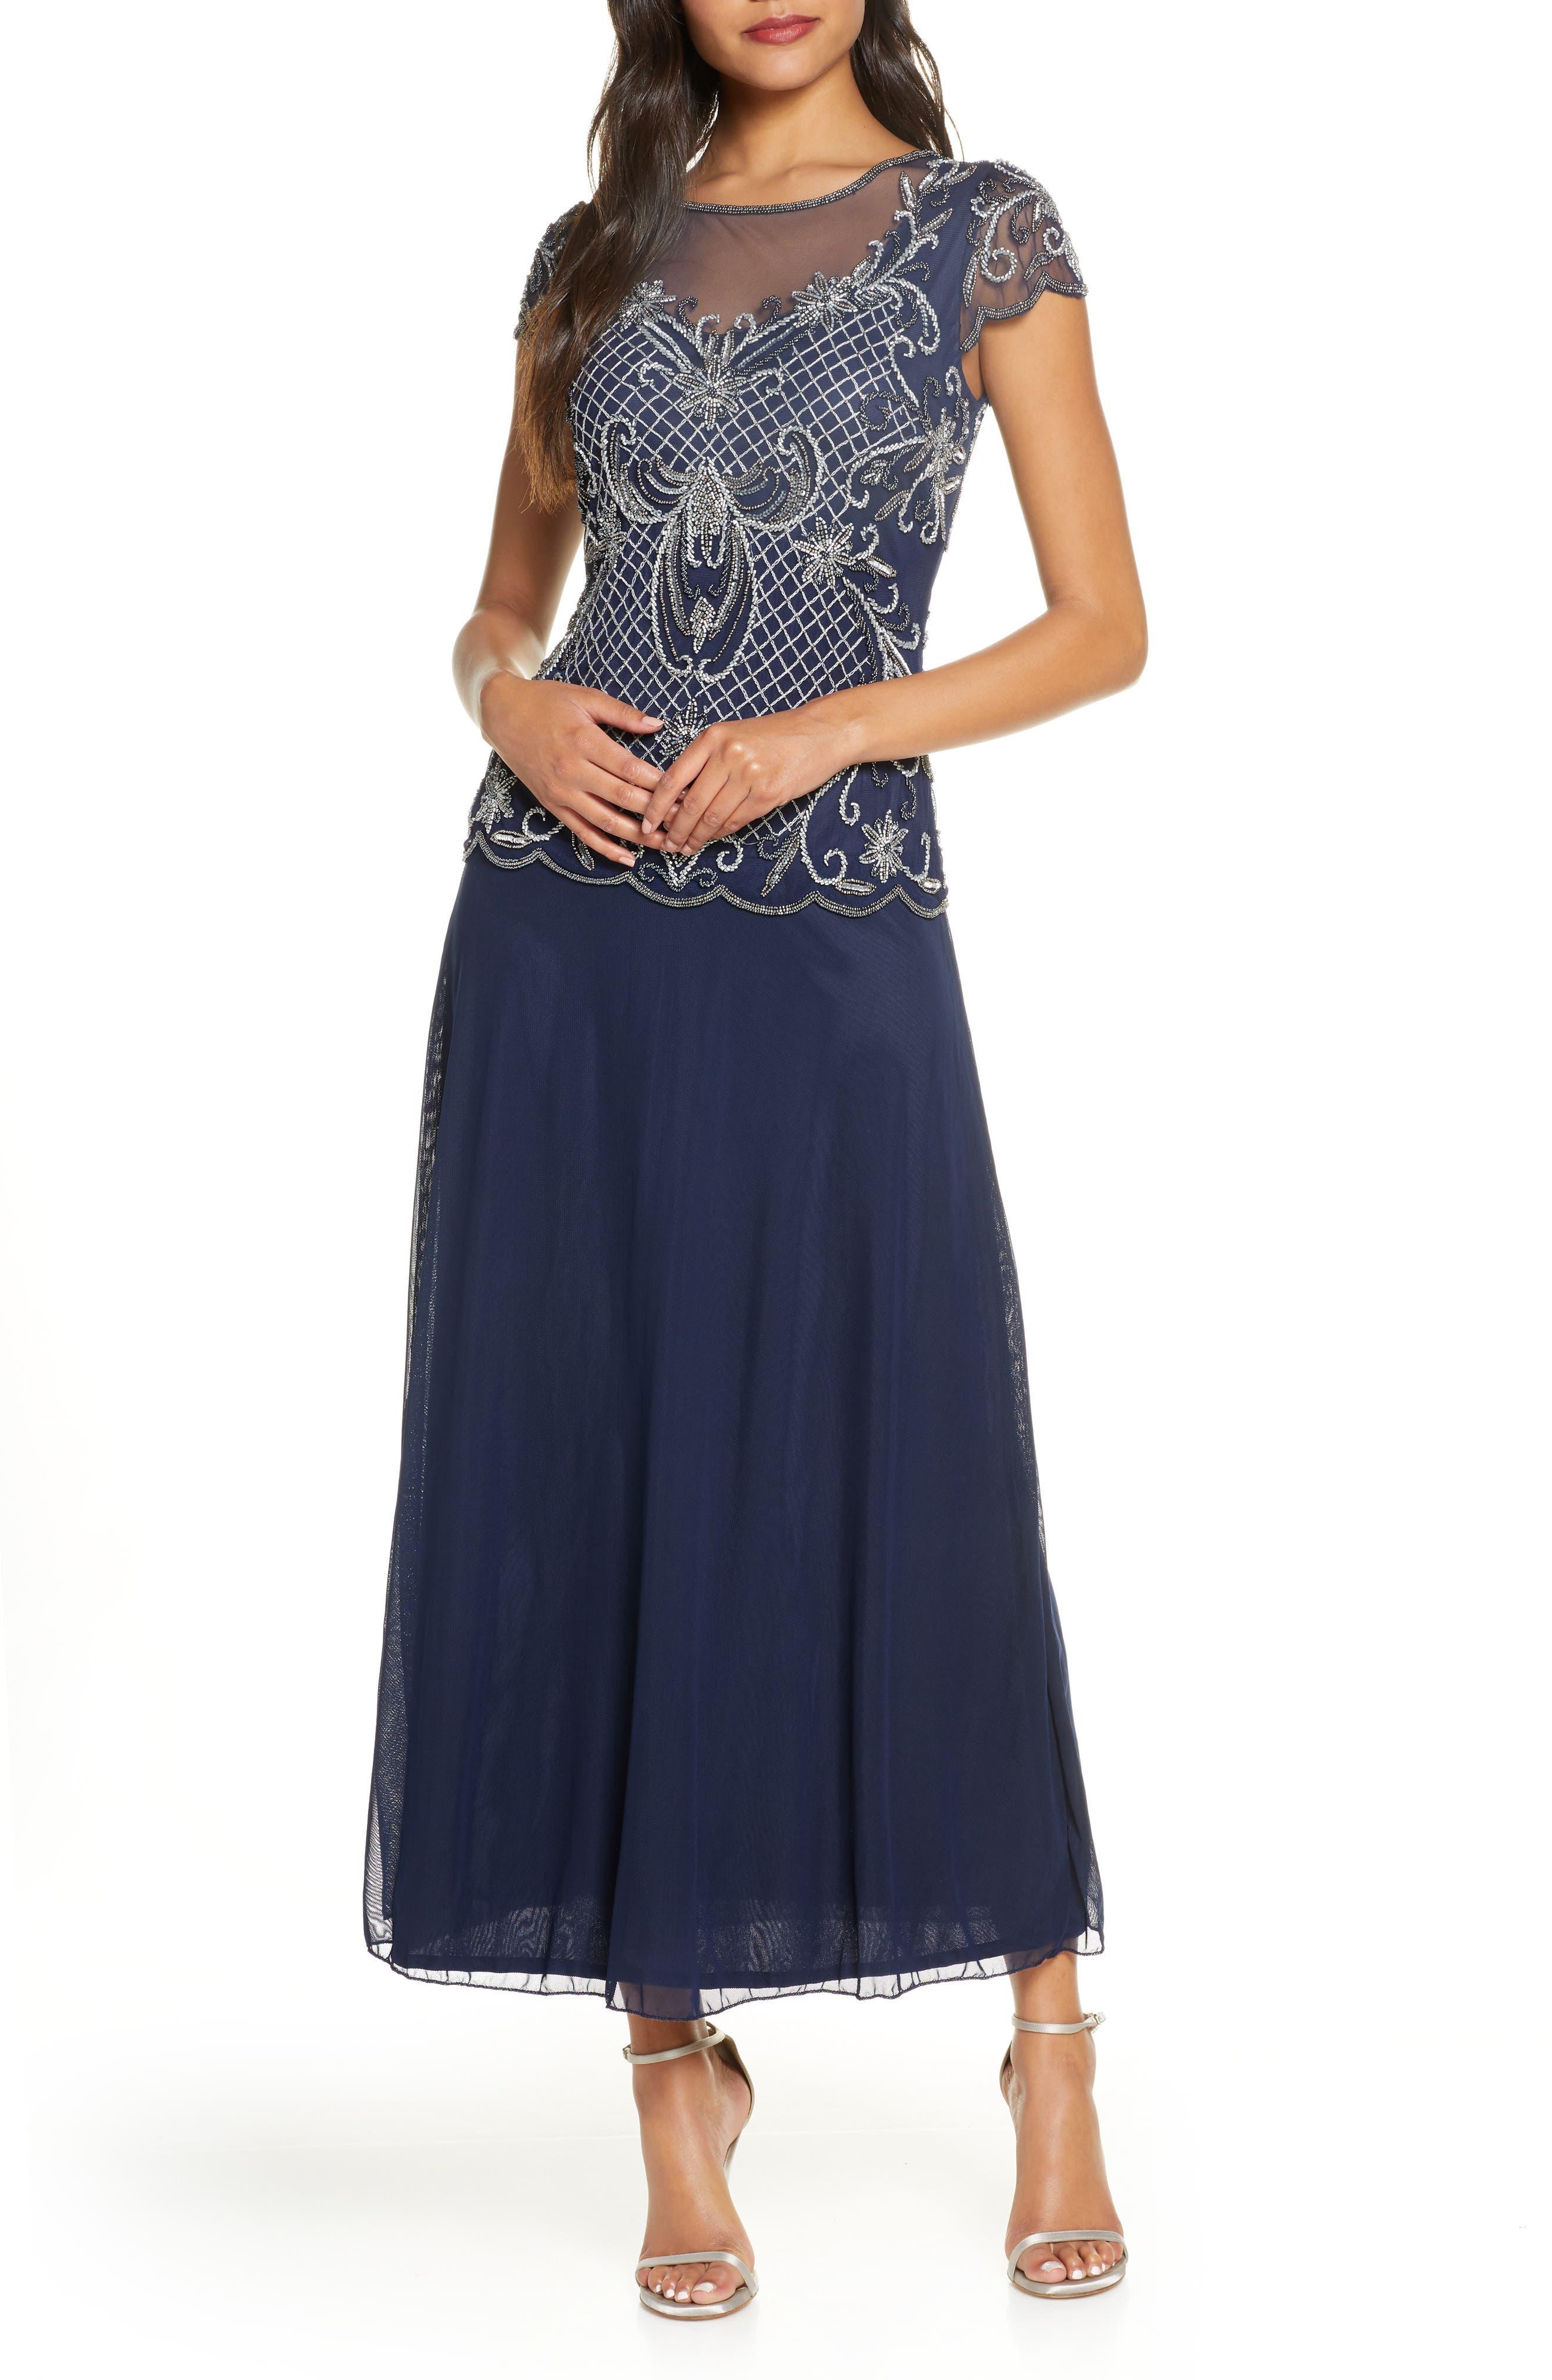 1920s Style Dresses, 20s Dresses Womens Pisarro Nights Mock Two-Piece Beaded Bodice Evening Dress Size 14 - Blue $118.80 AT vintagedancer.com